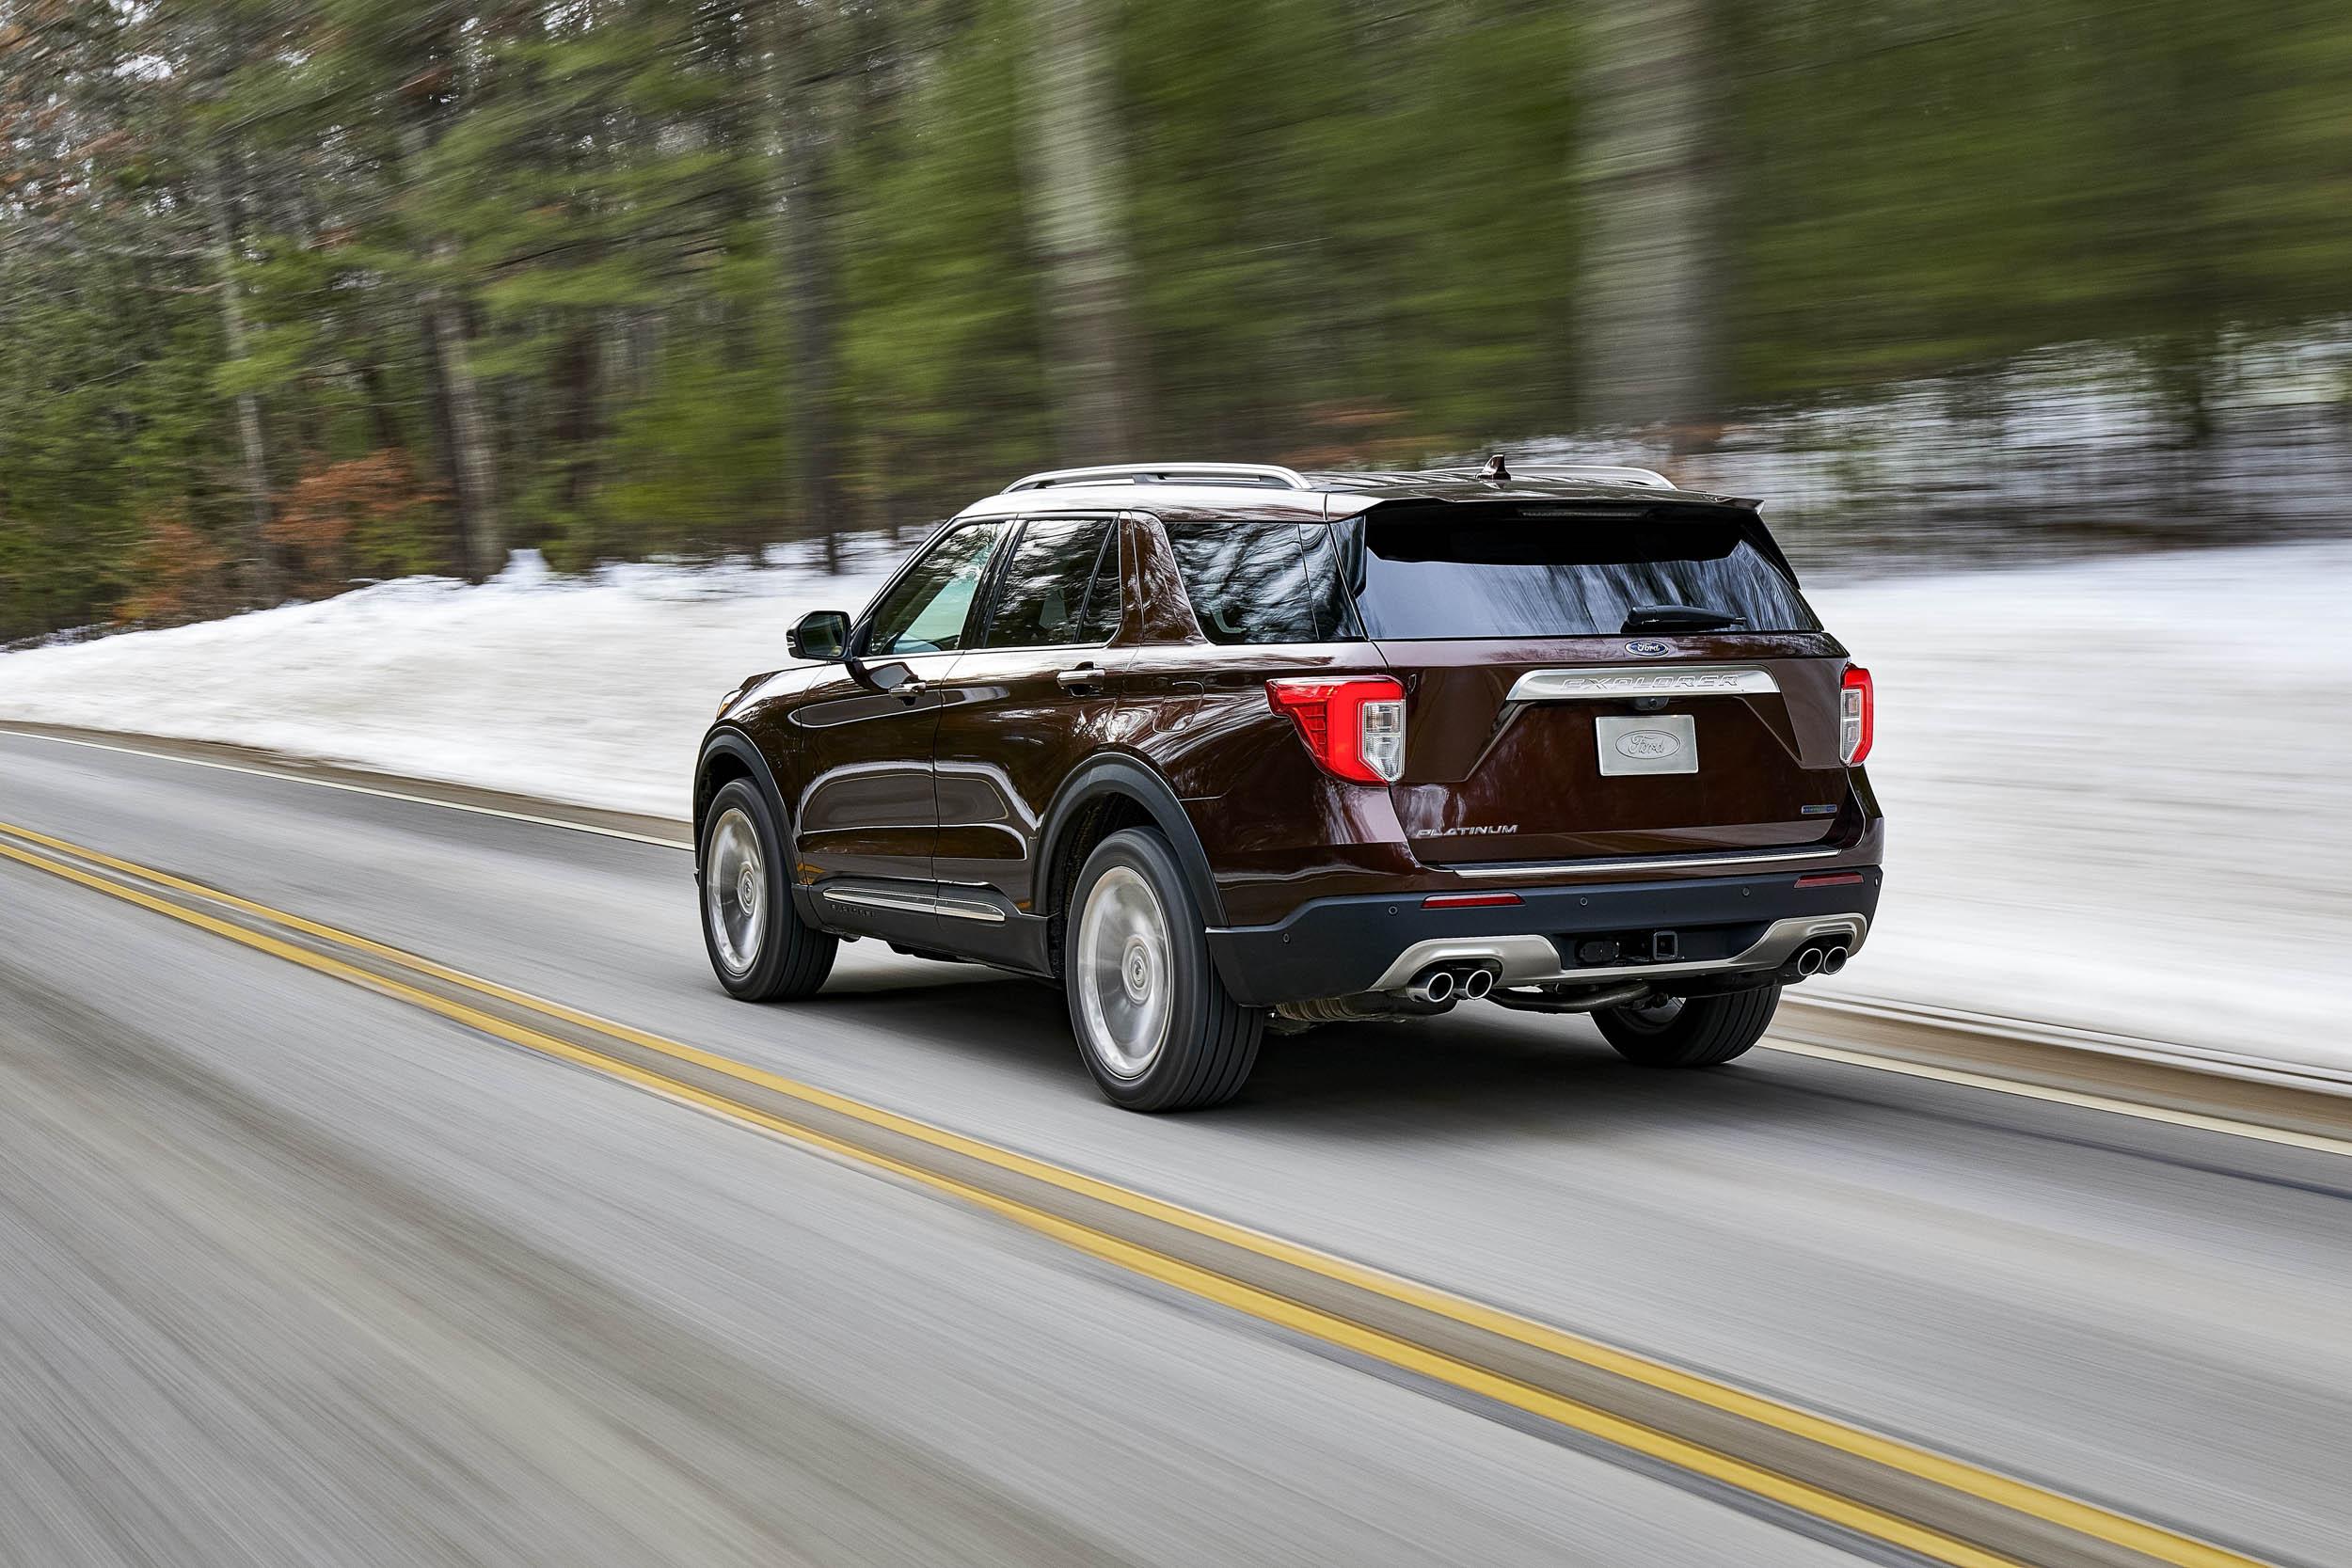 2020 Ford Explorer Platinum rear 3/4